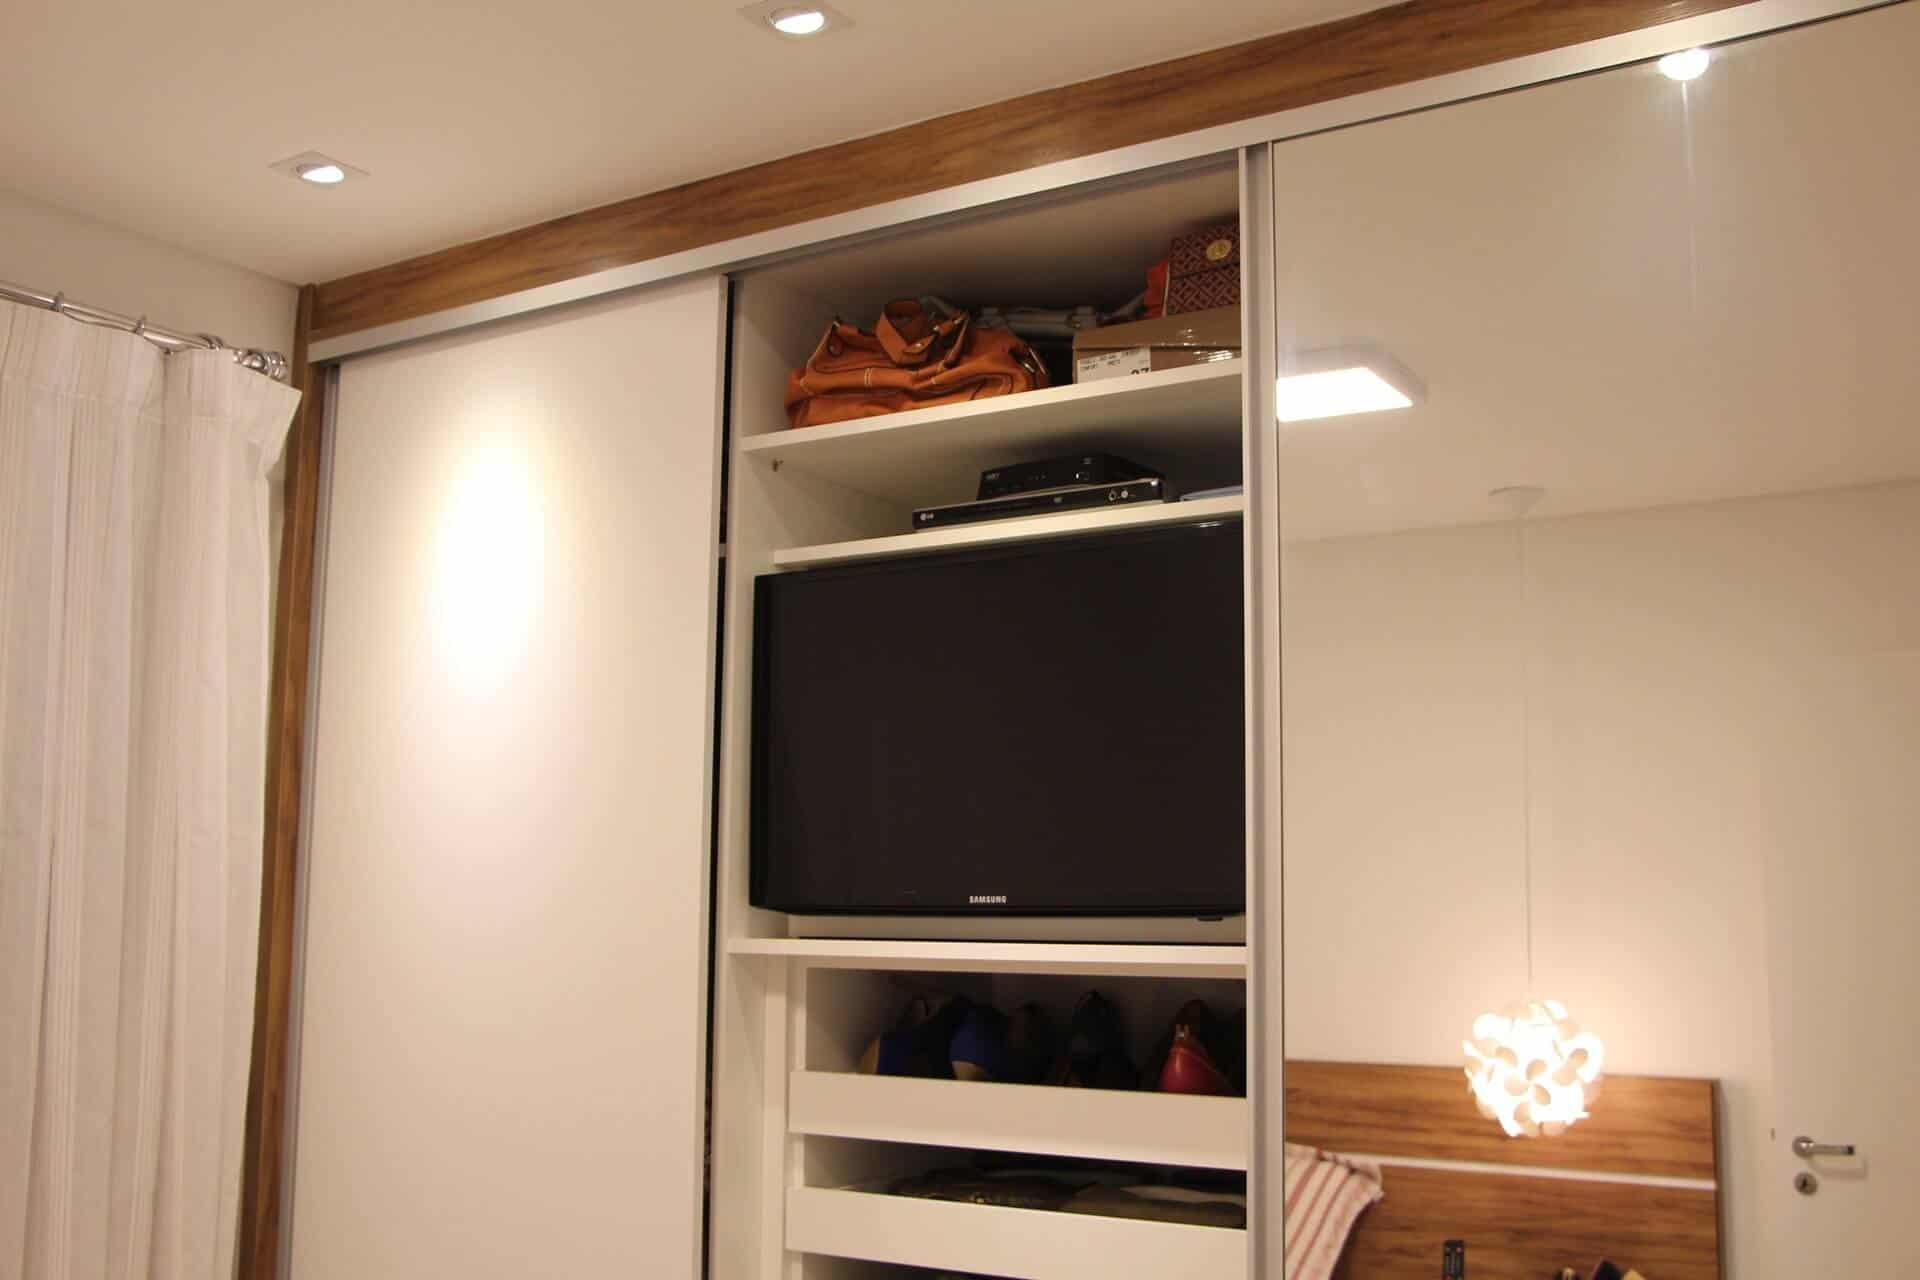 dormitorio-planejado_moveis-sob-medida-galeria-116